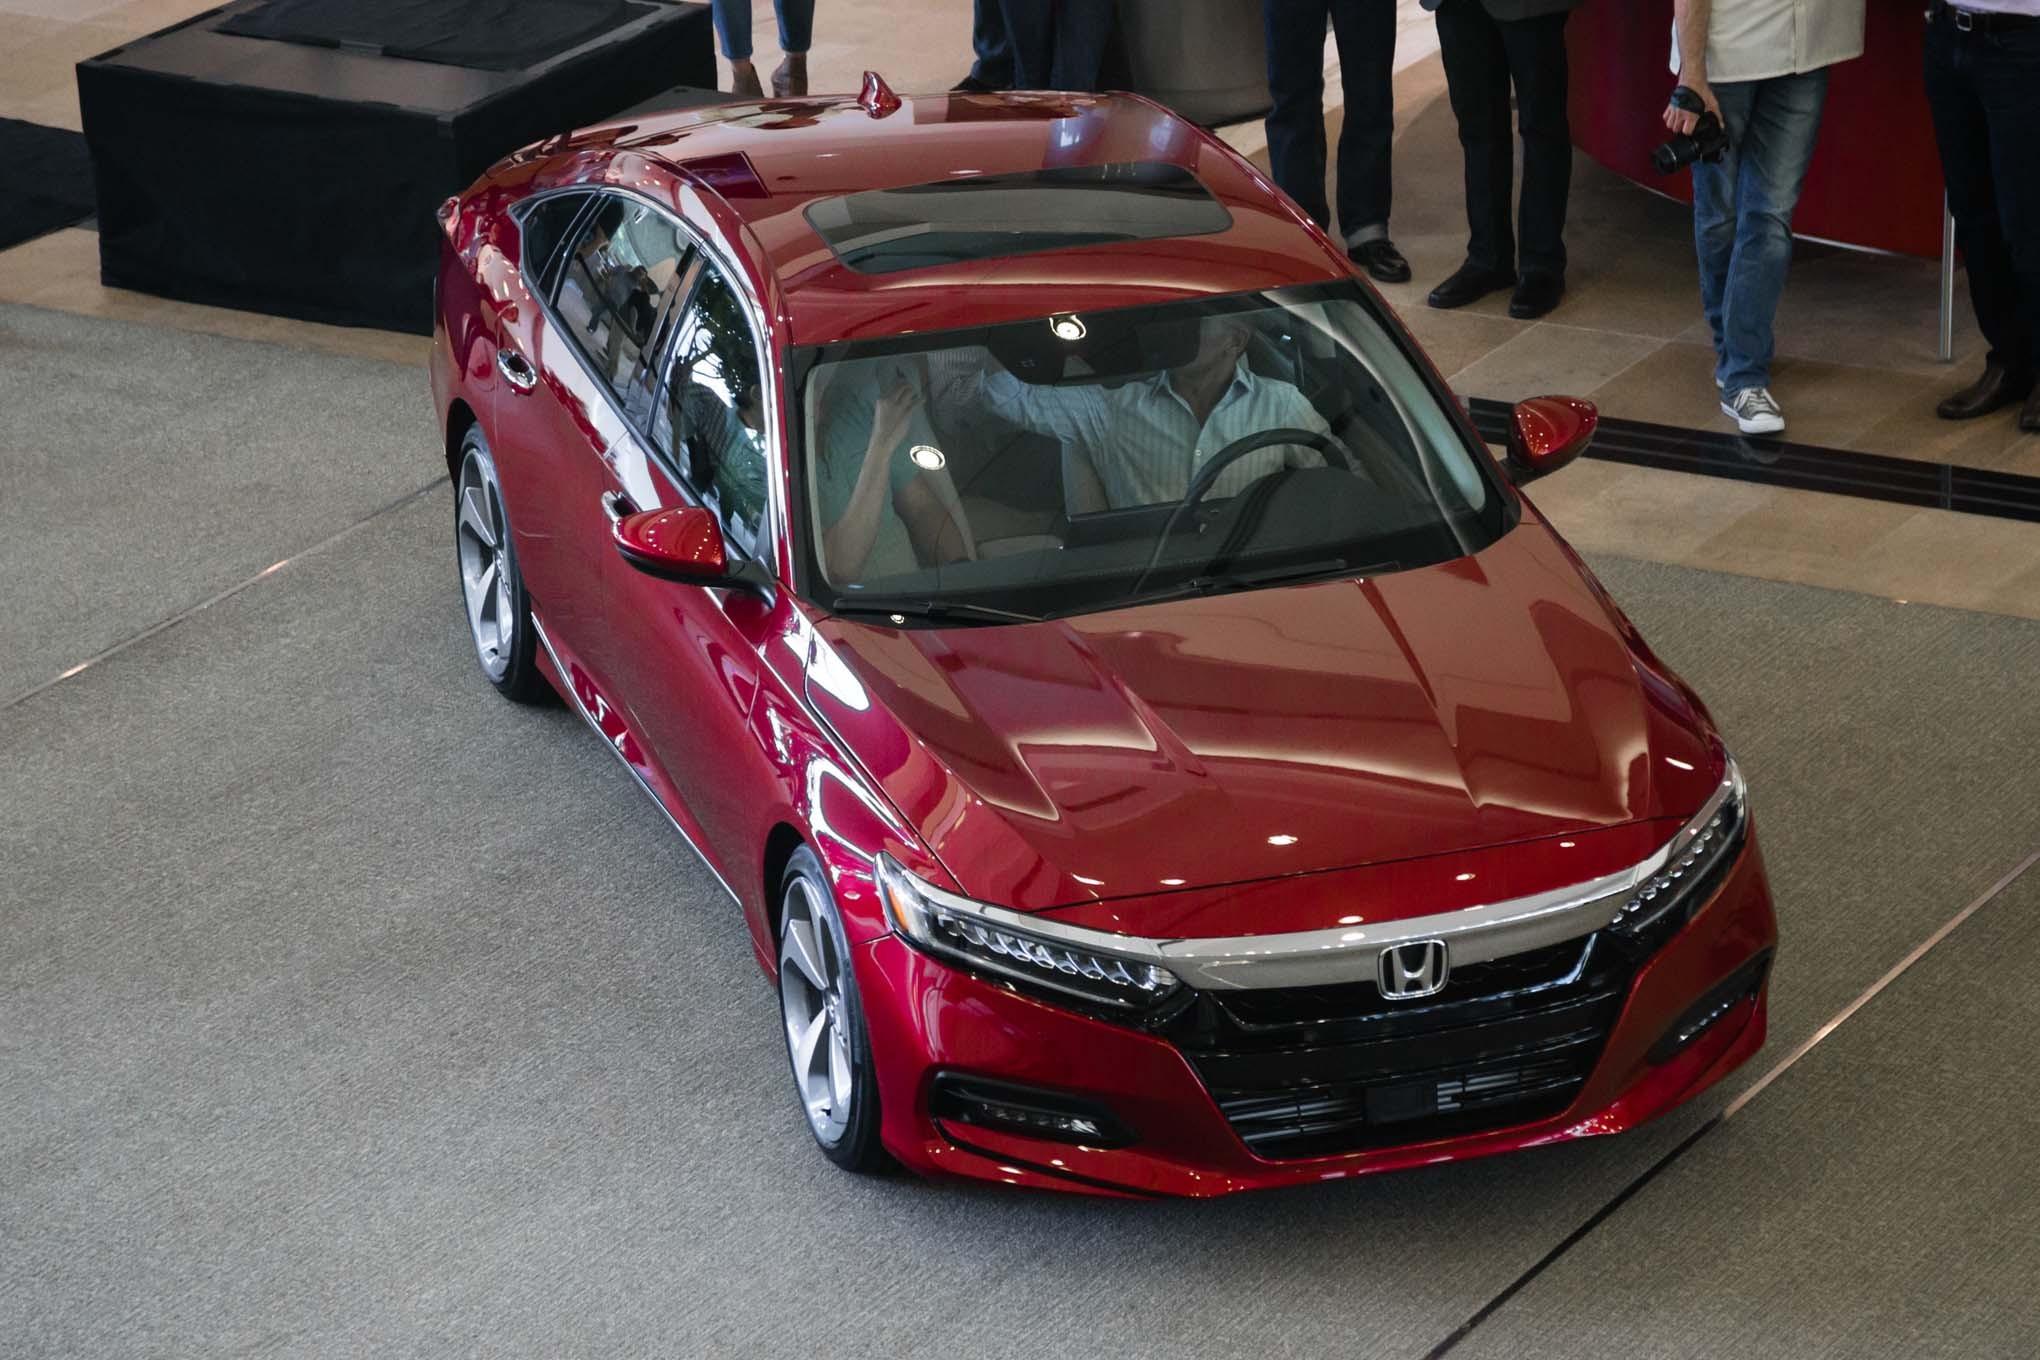 10th generation accord accord pakwheels forums for Honda accord generations